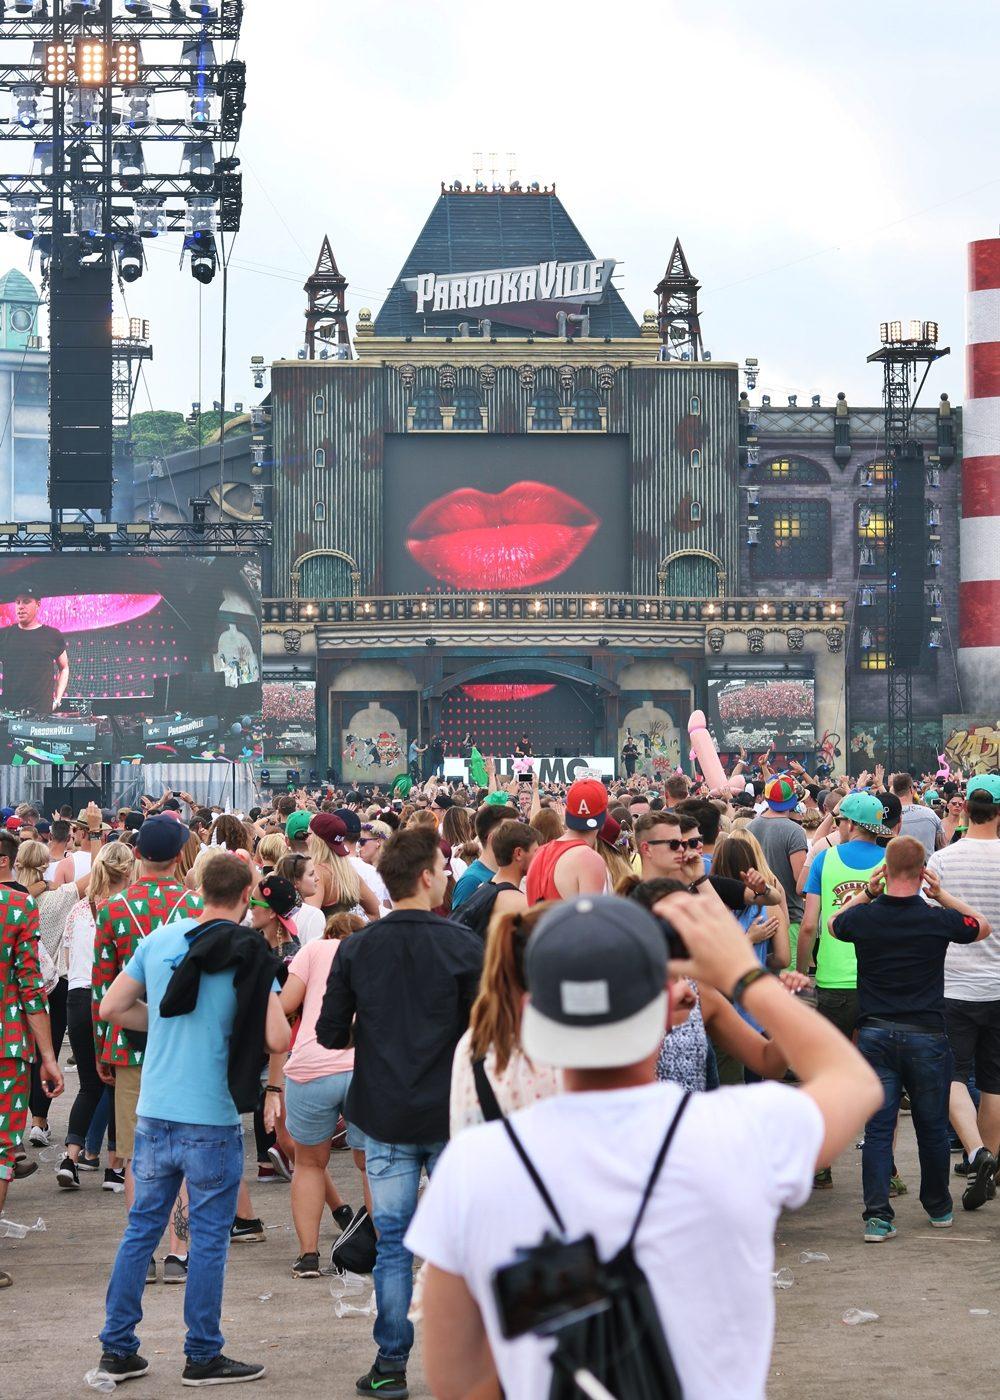 Parookaville Festival 2016 Weeze Electro Festivalblogger (29)